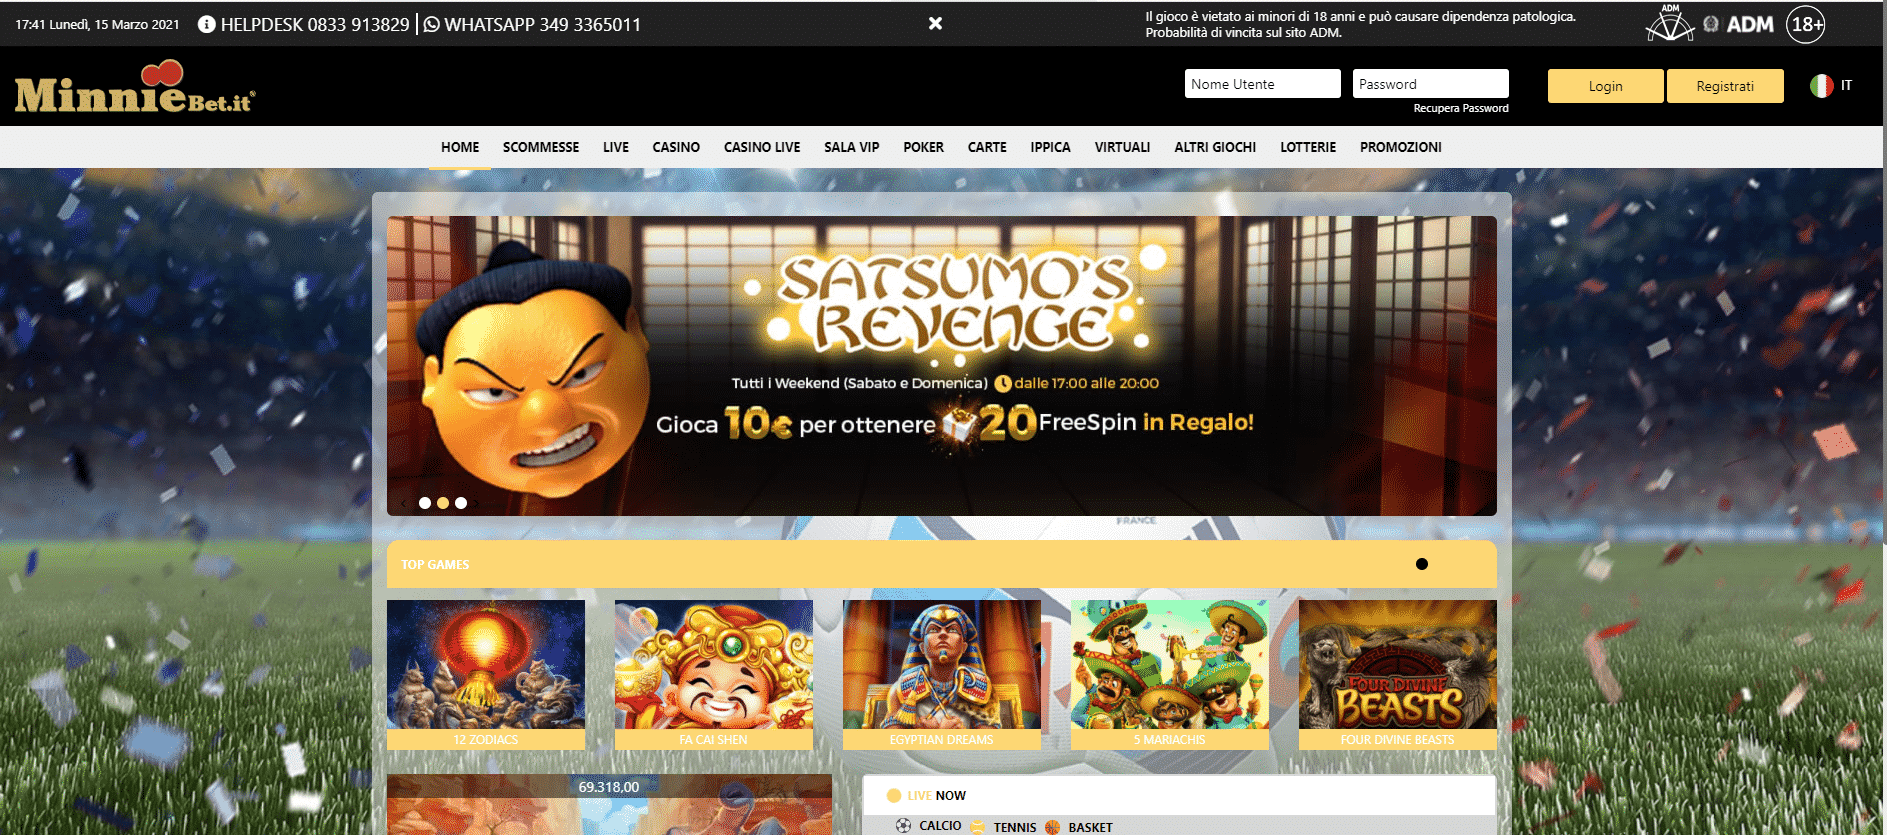 Minniebet Homepage